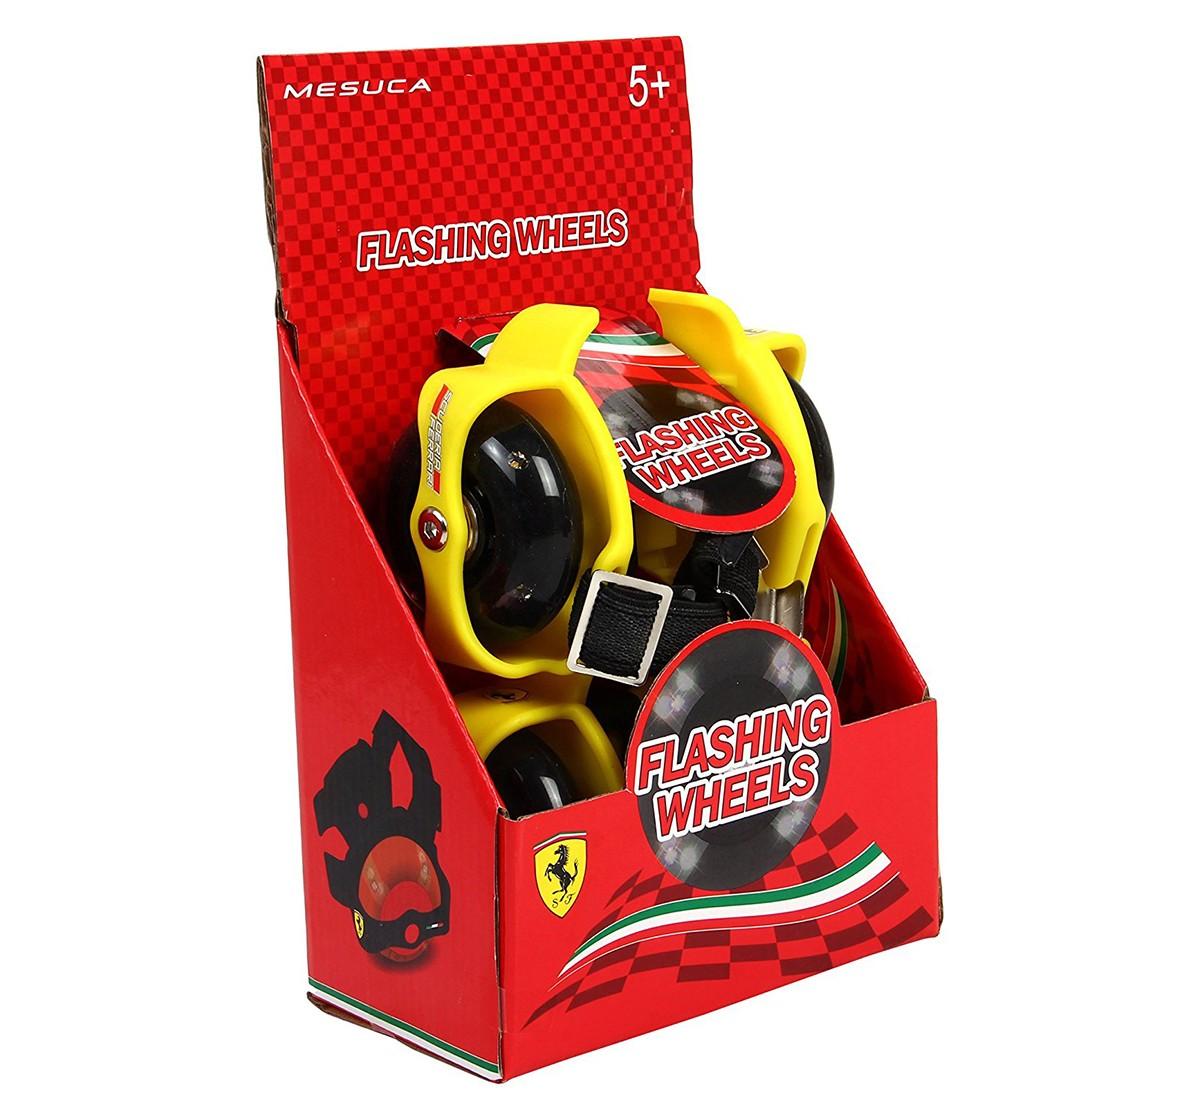 Ferrari Flashing Wheels Roller Skate, Skates and Skateboards for Kids age 5Y+ (Yellow)